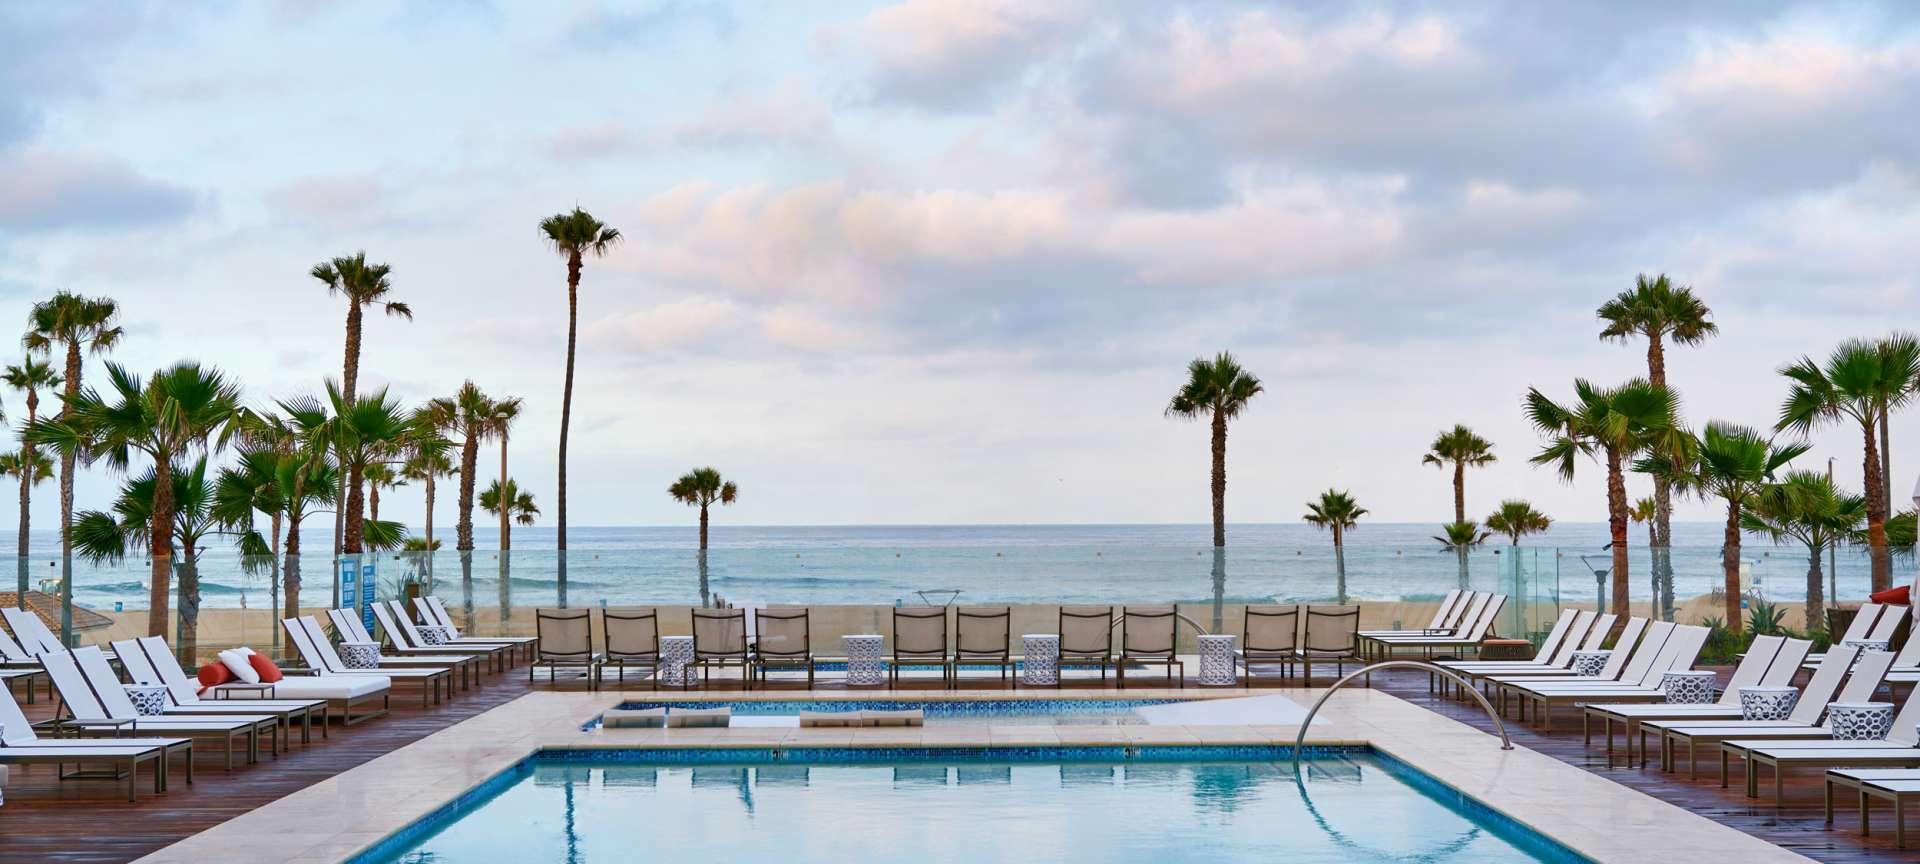 Huntington Beach Hotel Specials And